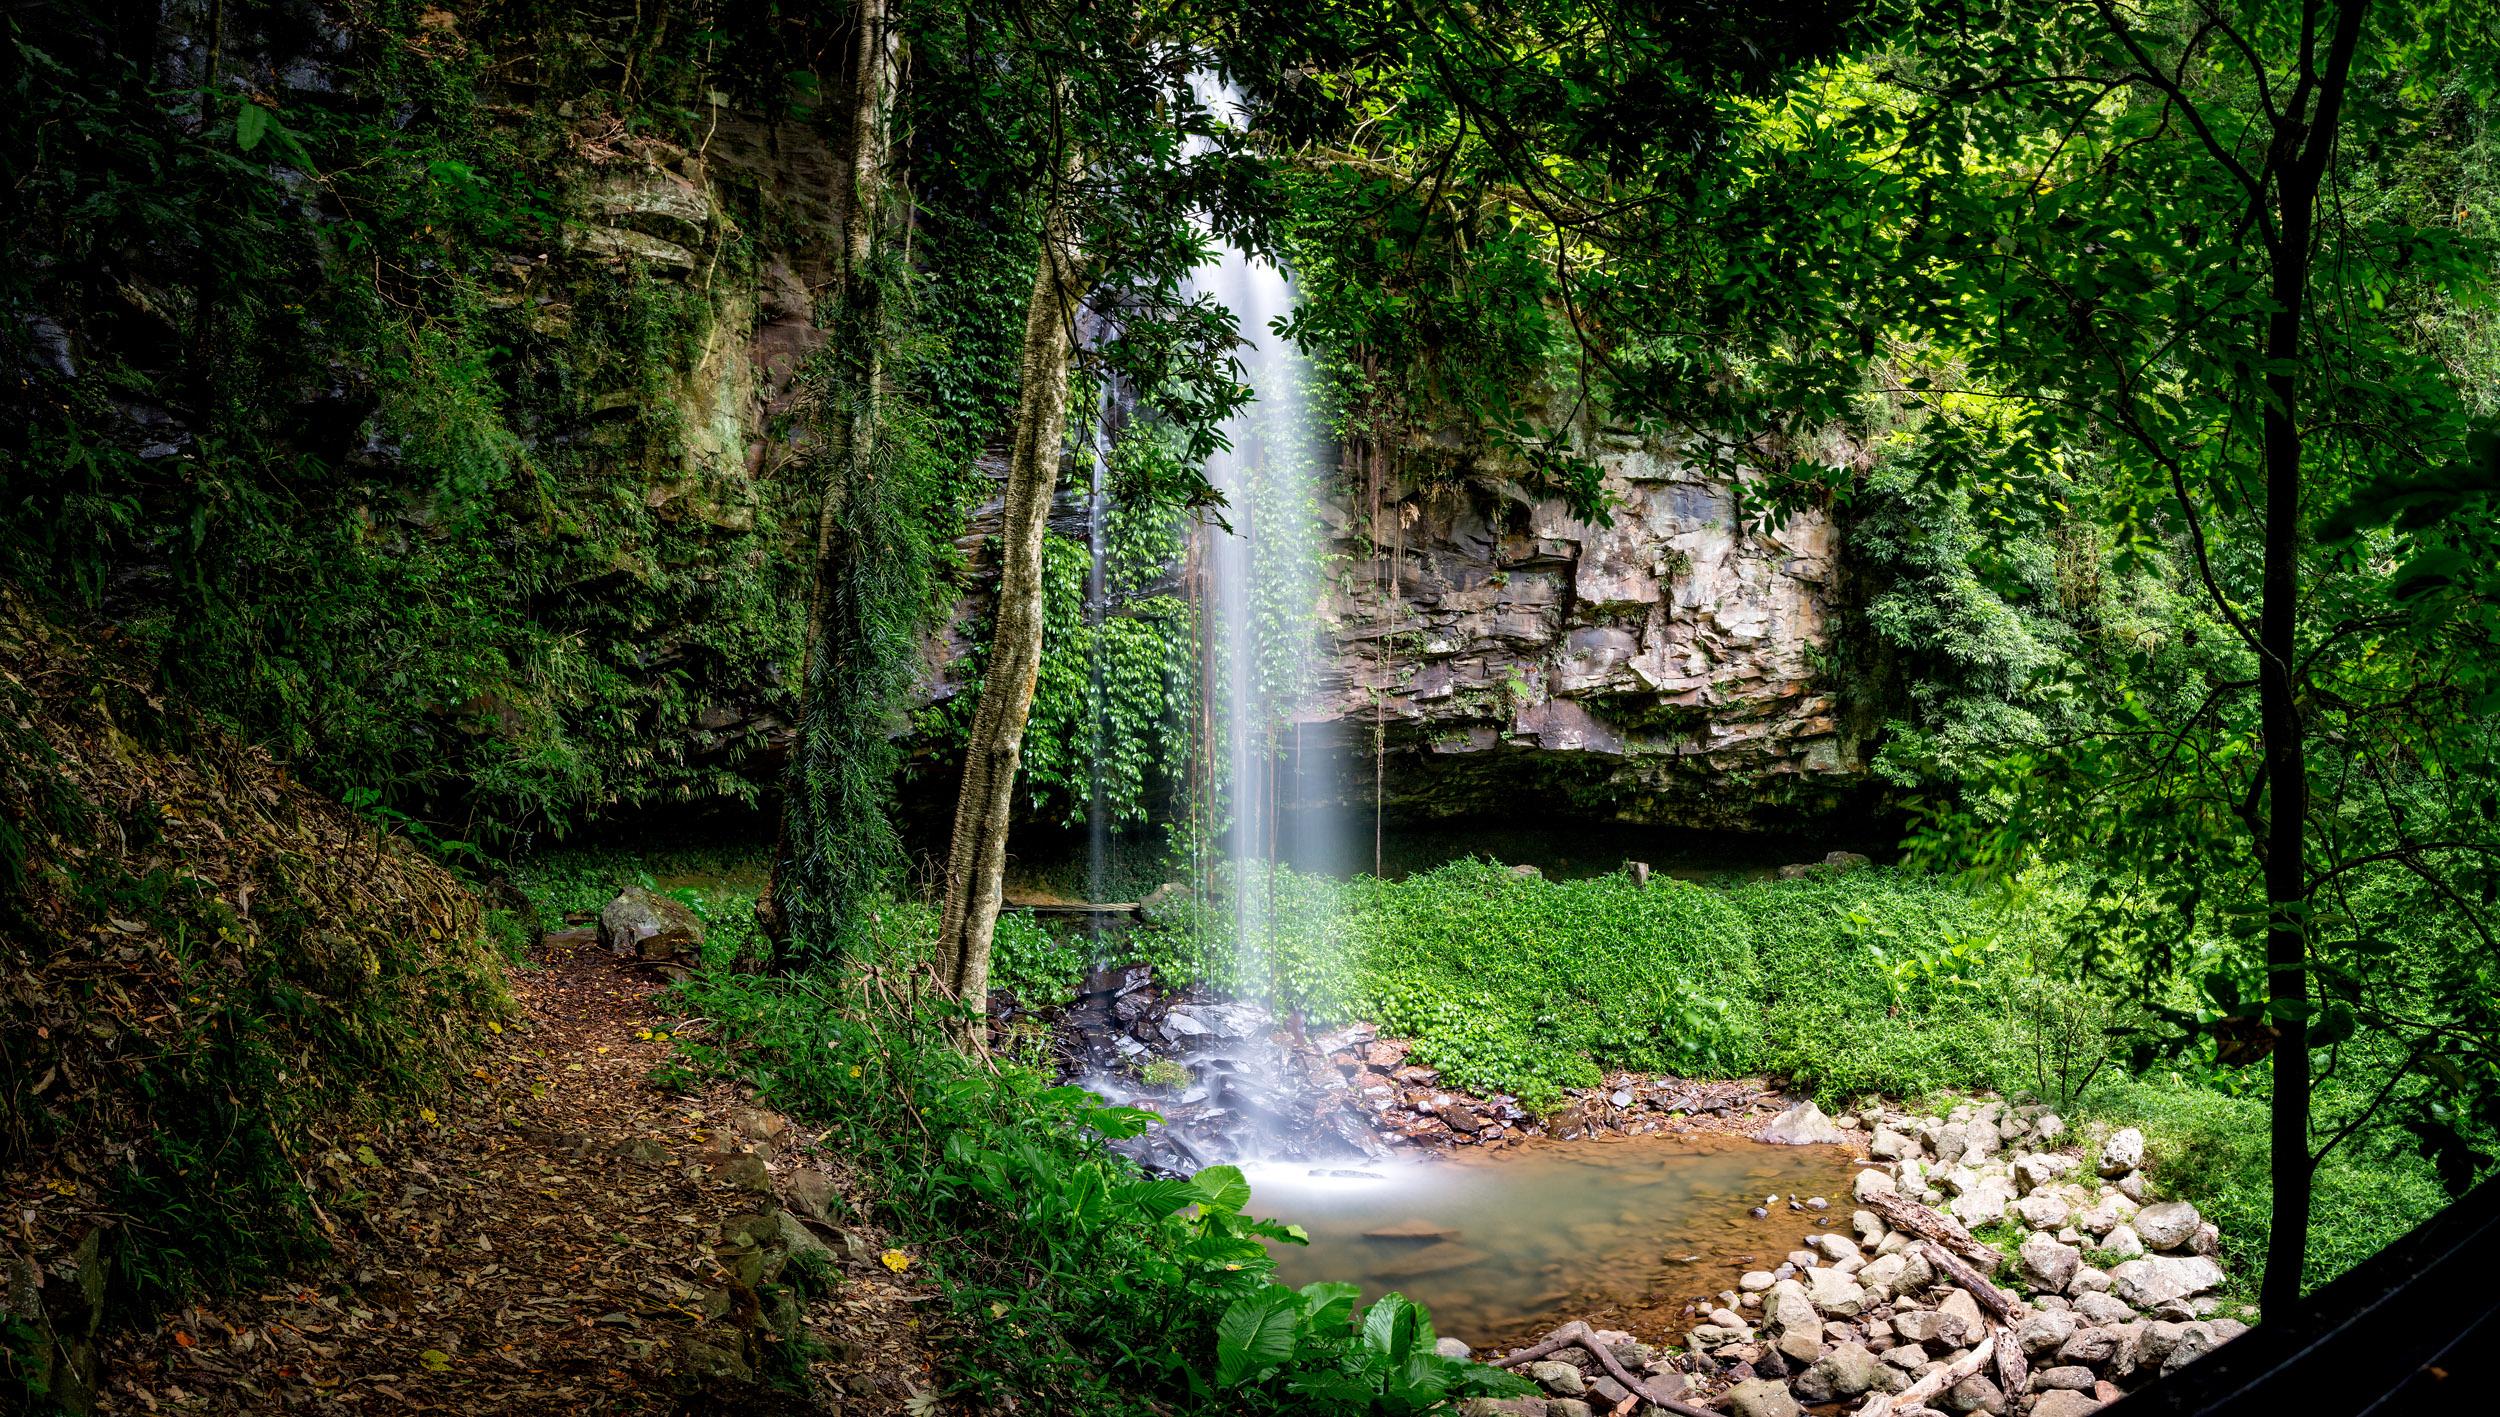 crystal-shower-falls-dorrigo-nsw.jpg